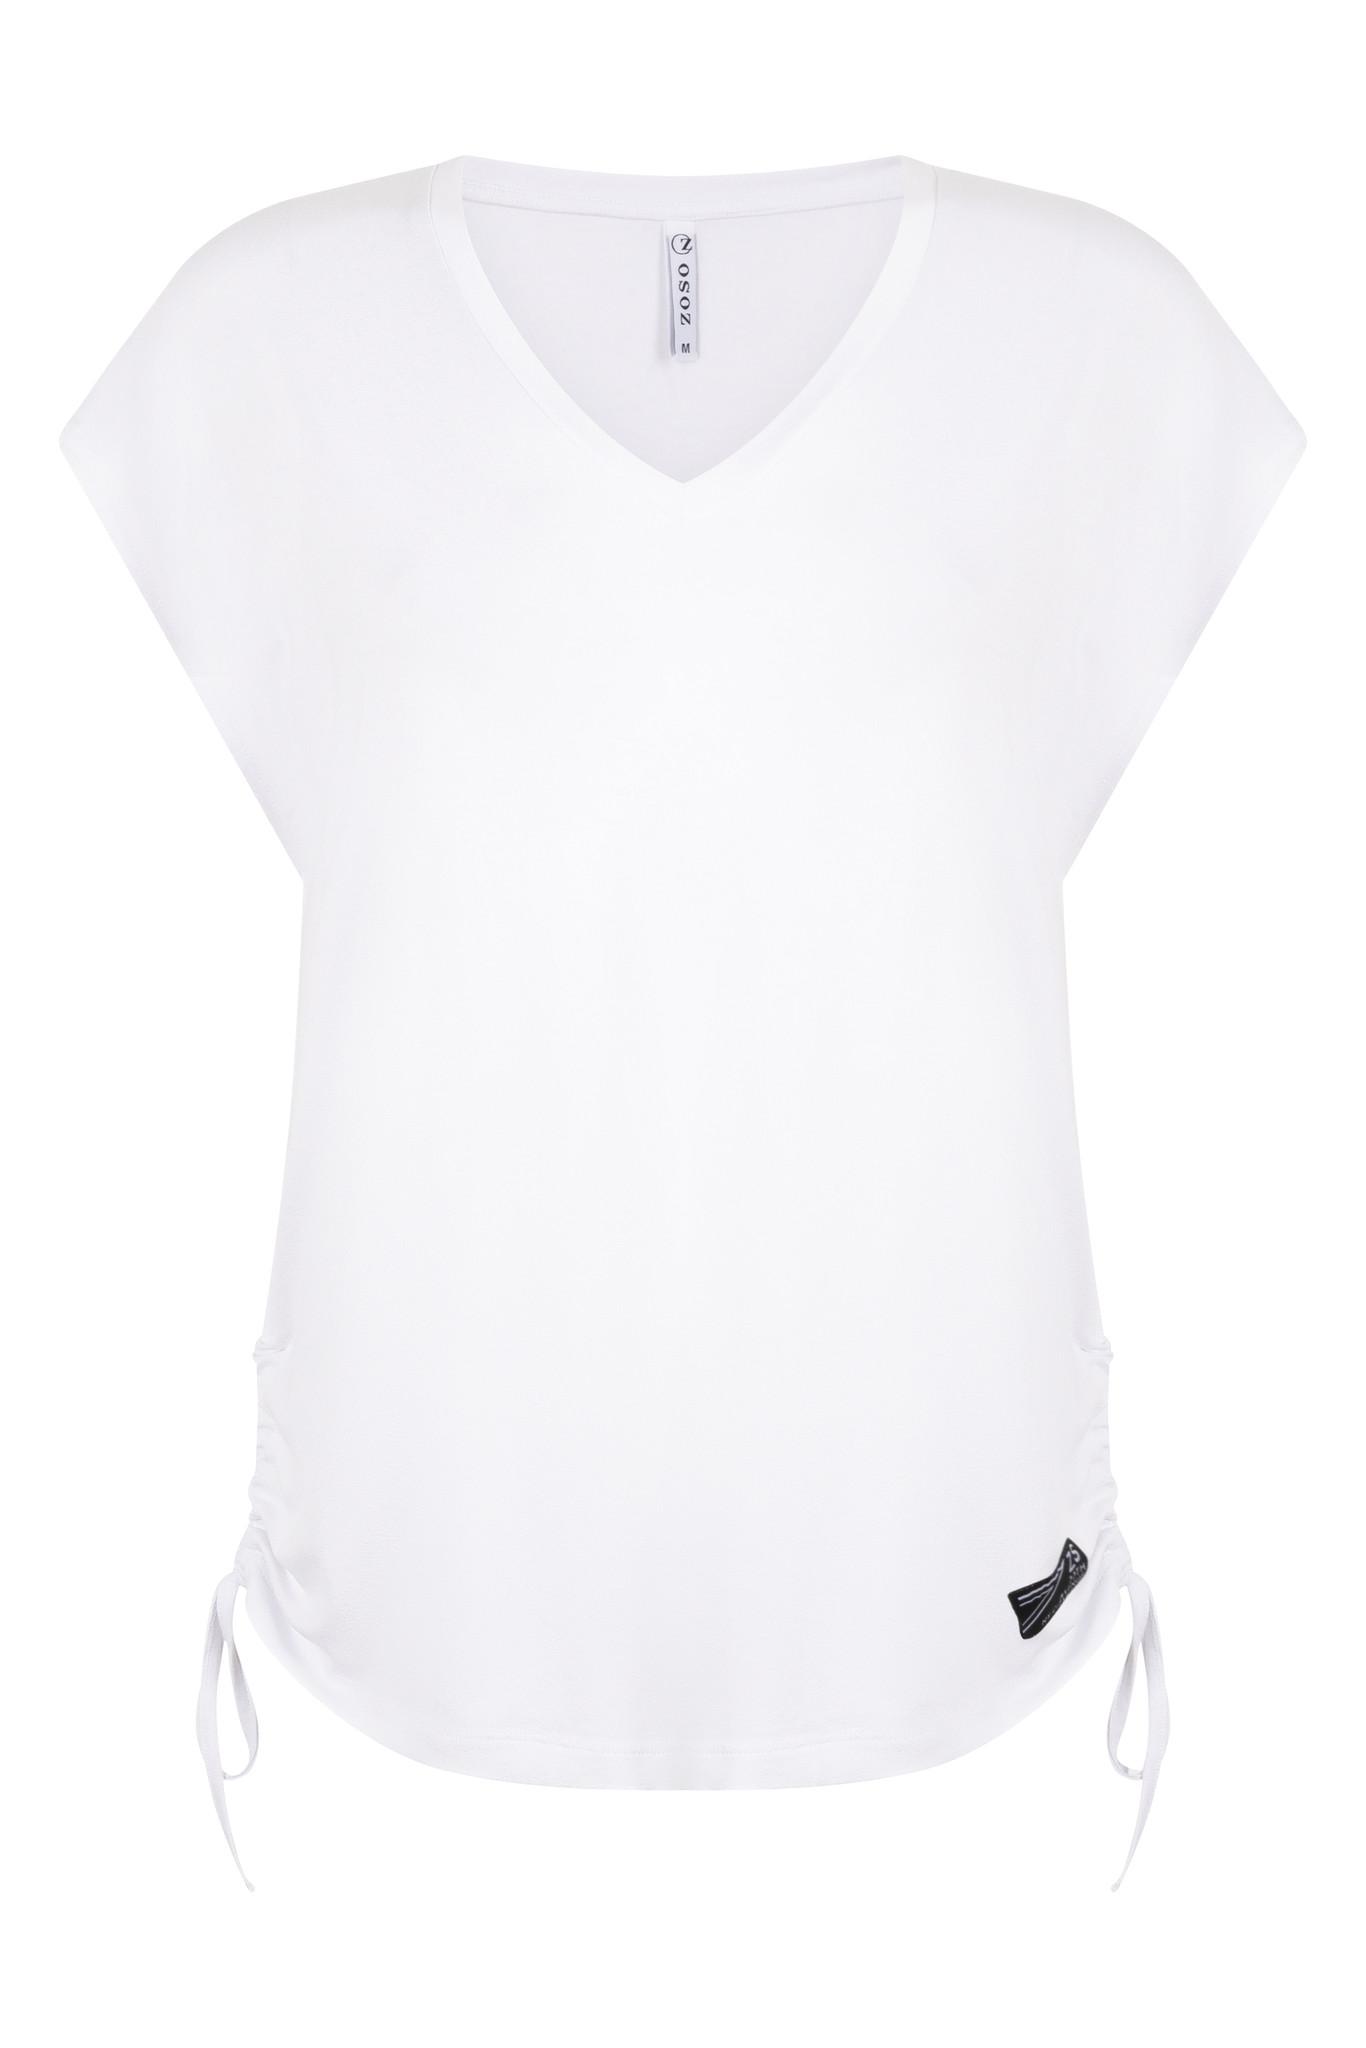 Zoso Zoso Lauren t-shirt with side detail white